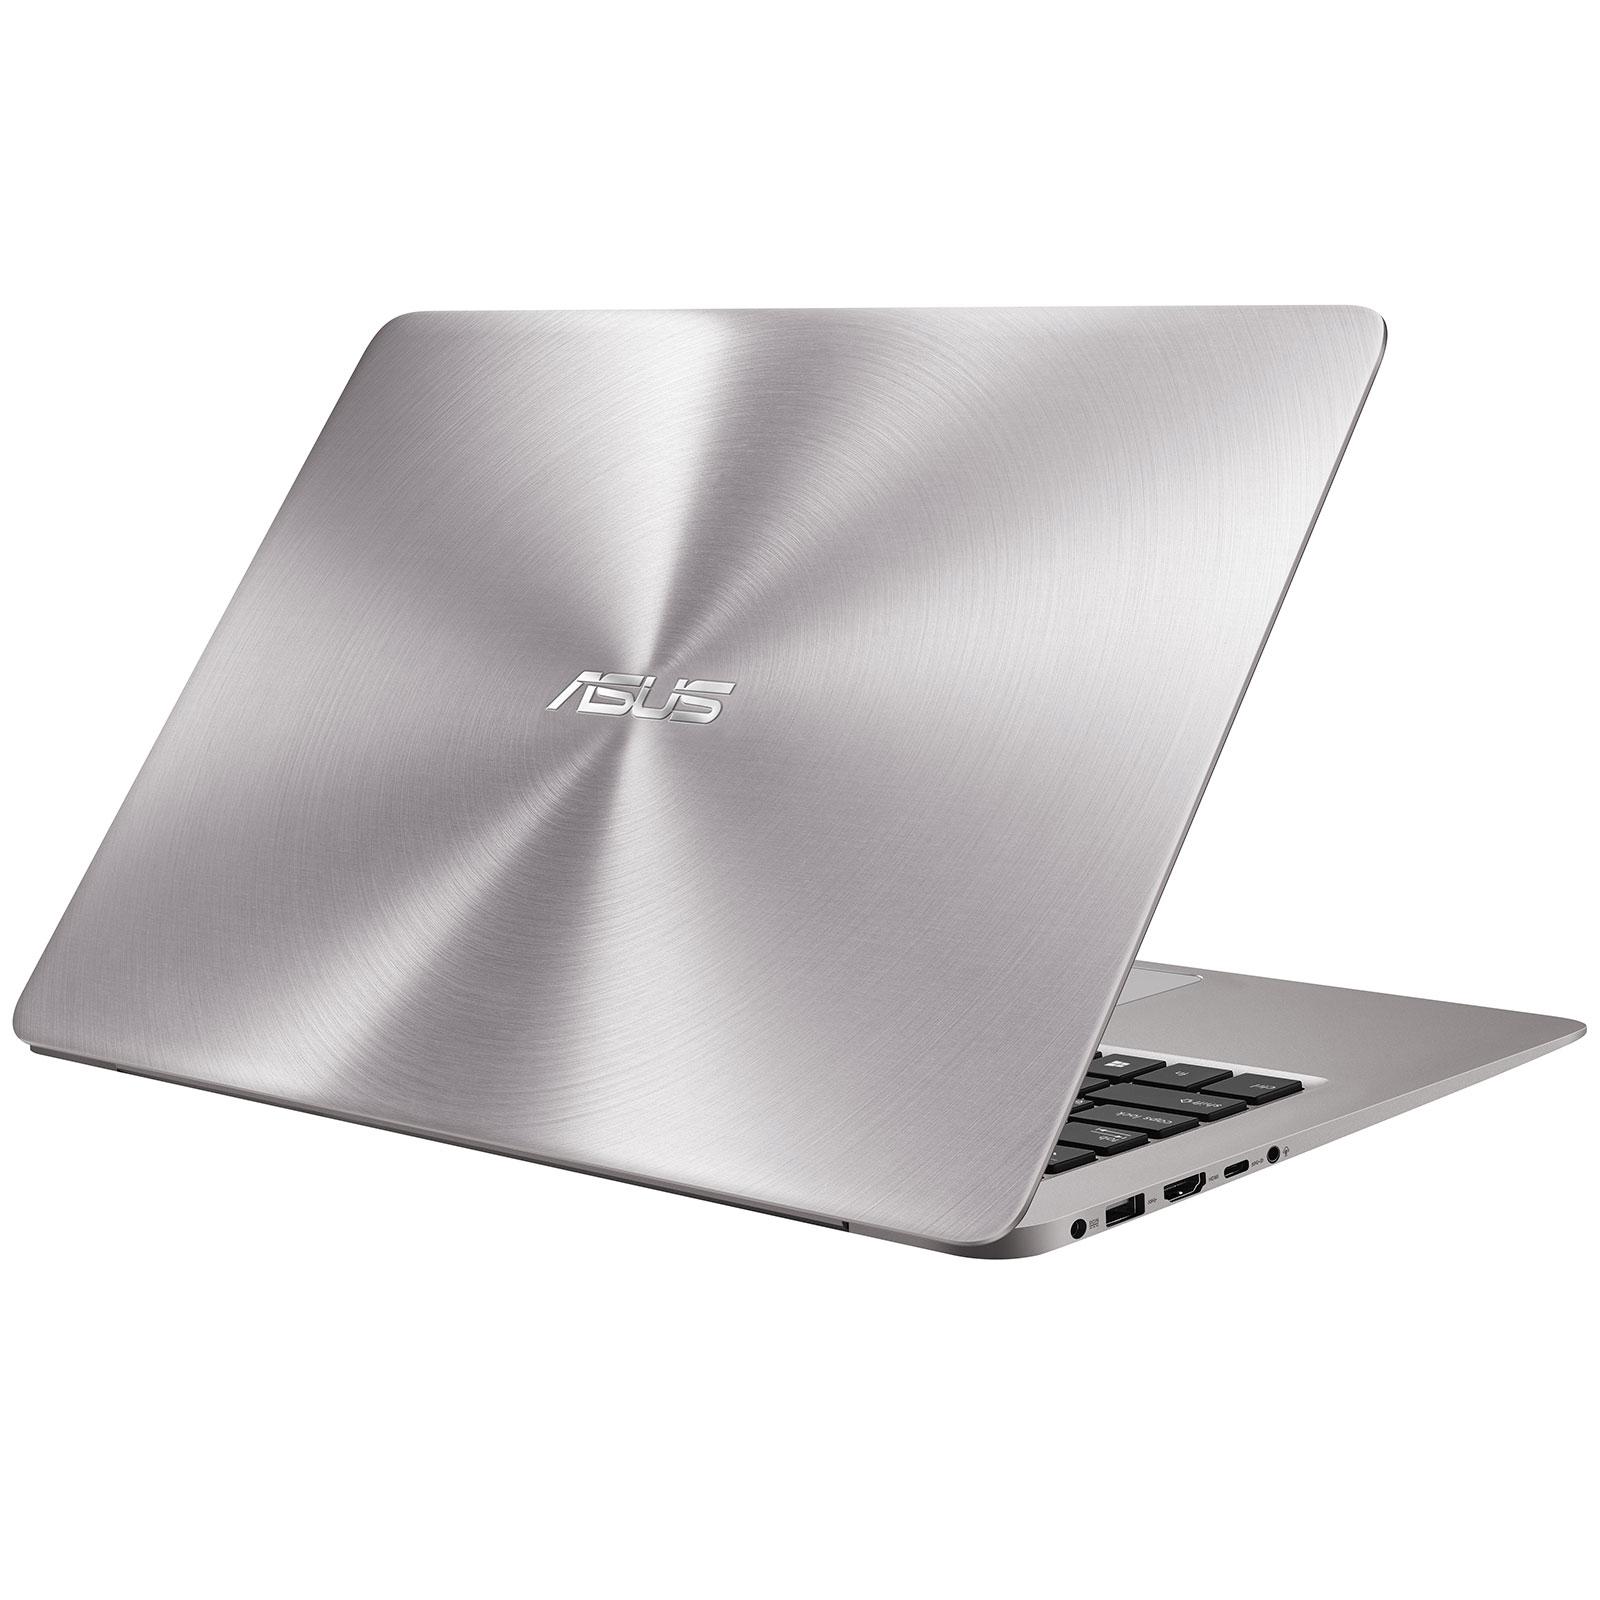 Asus 90NB0DL3-M07240 - PC portable Asus - Cybertek.fr - 1